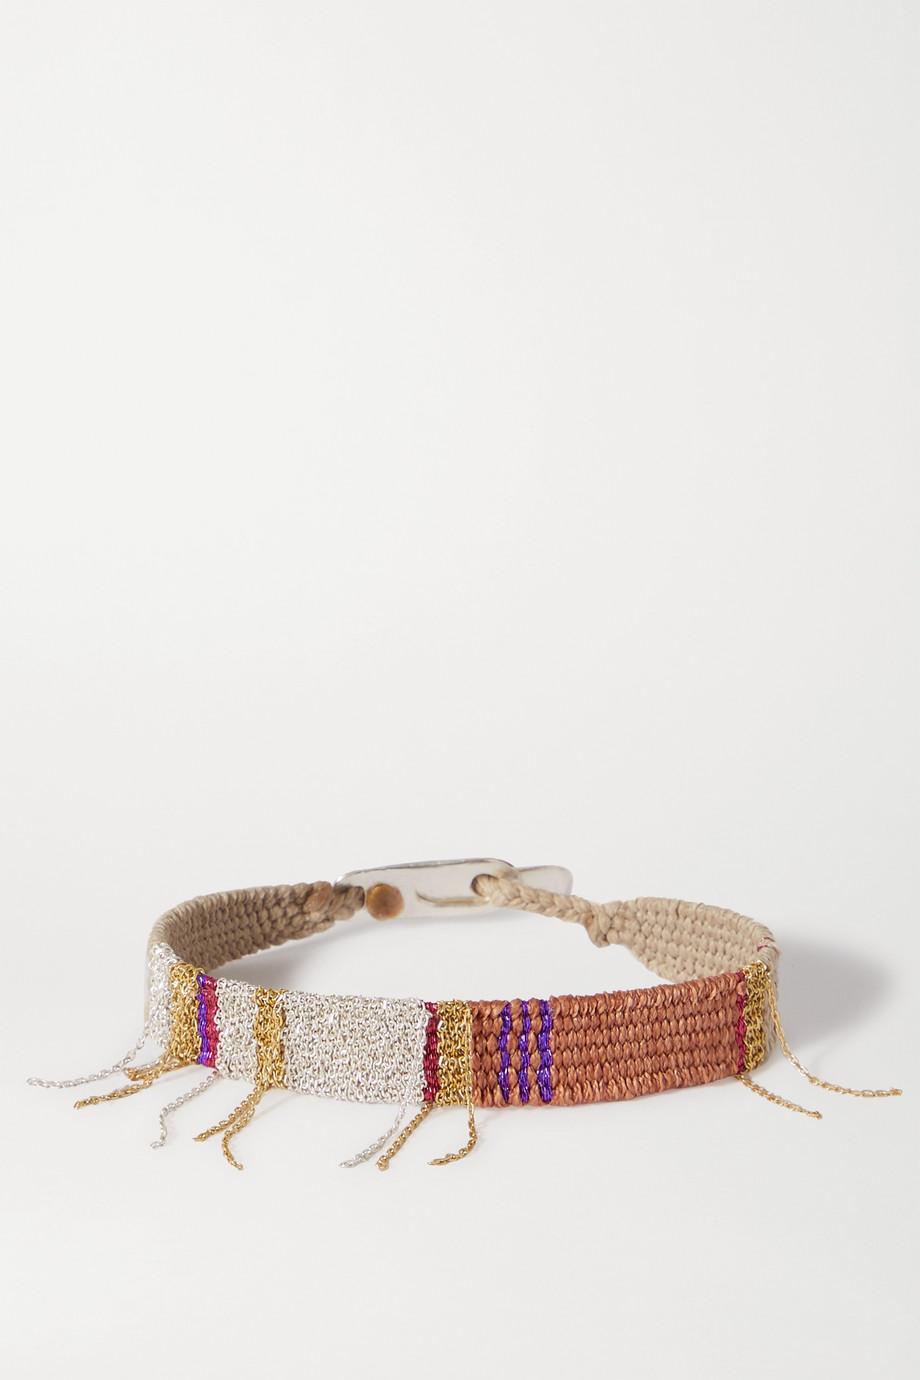 Katia Alpha Metallic woven cord, gold vermeil and silver bracelet